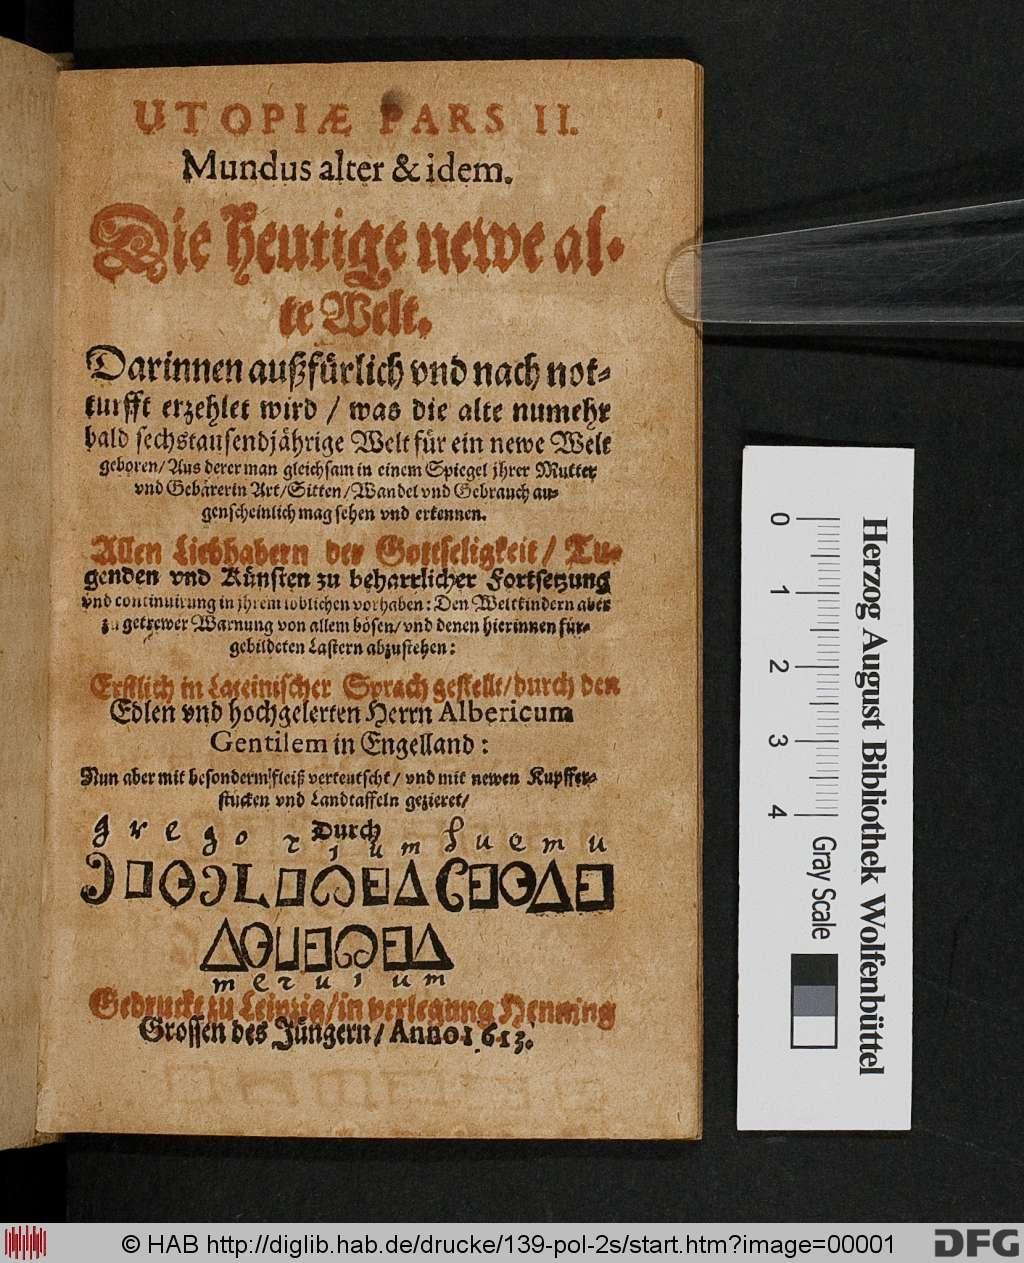 http://diglib.hab.de/drucke/139-pol-2s/00001.jpg